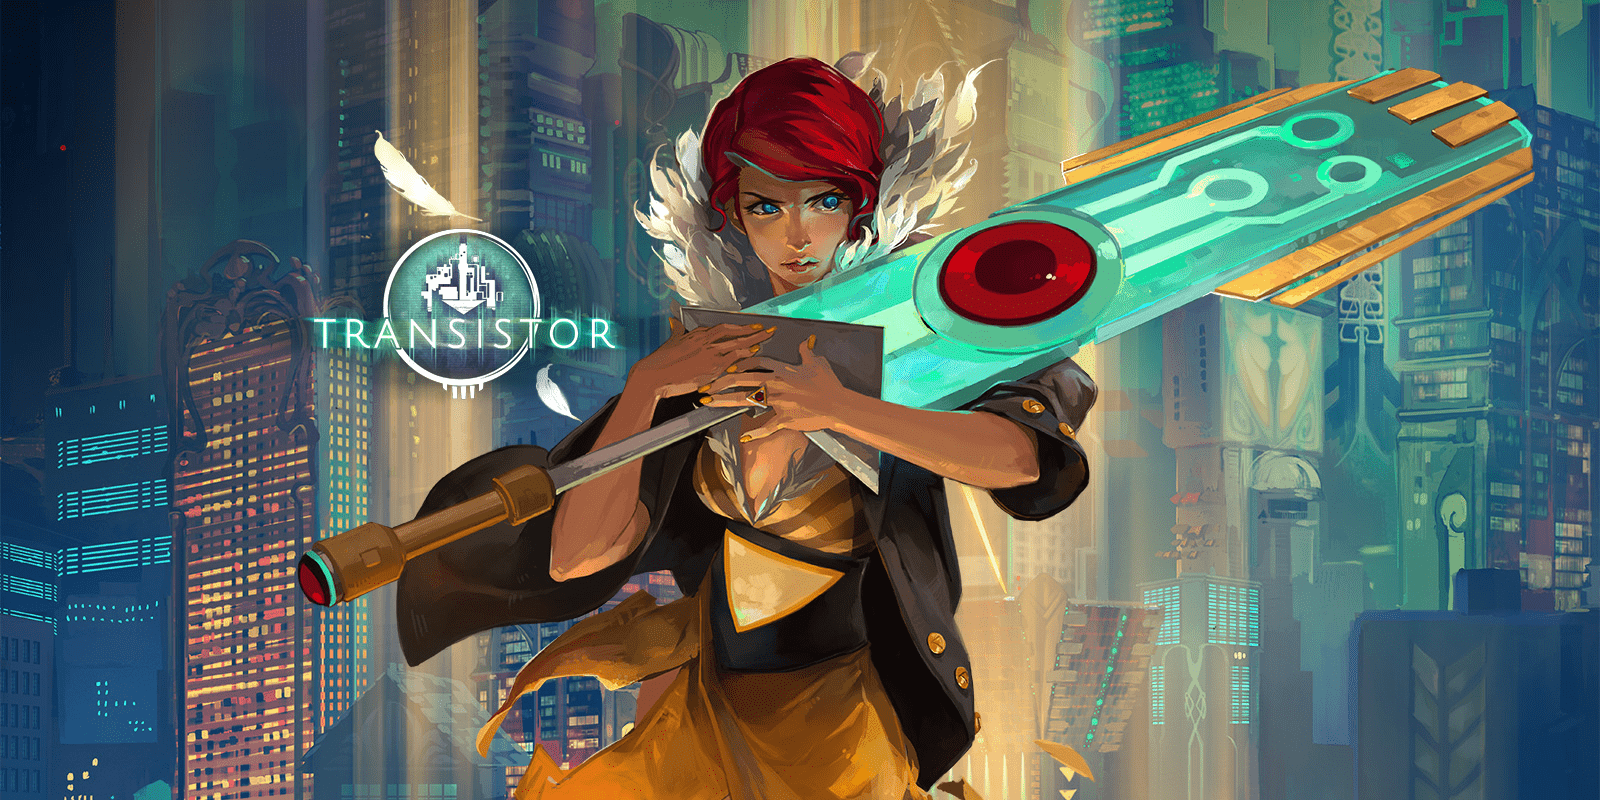 Раздача: научно-фантастический экшен-RPG Transistor